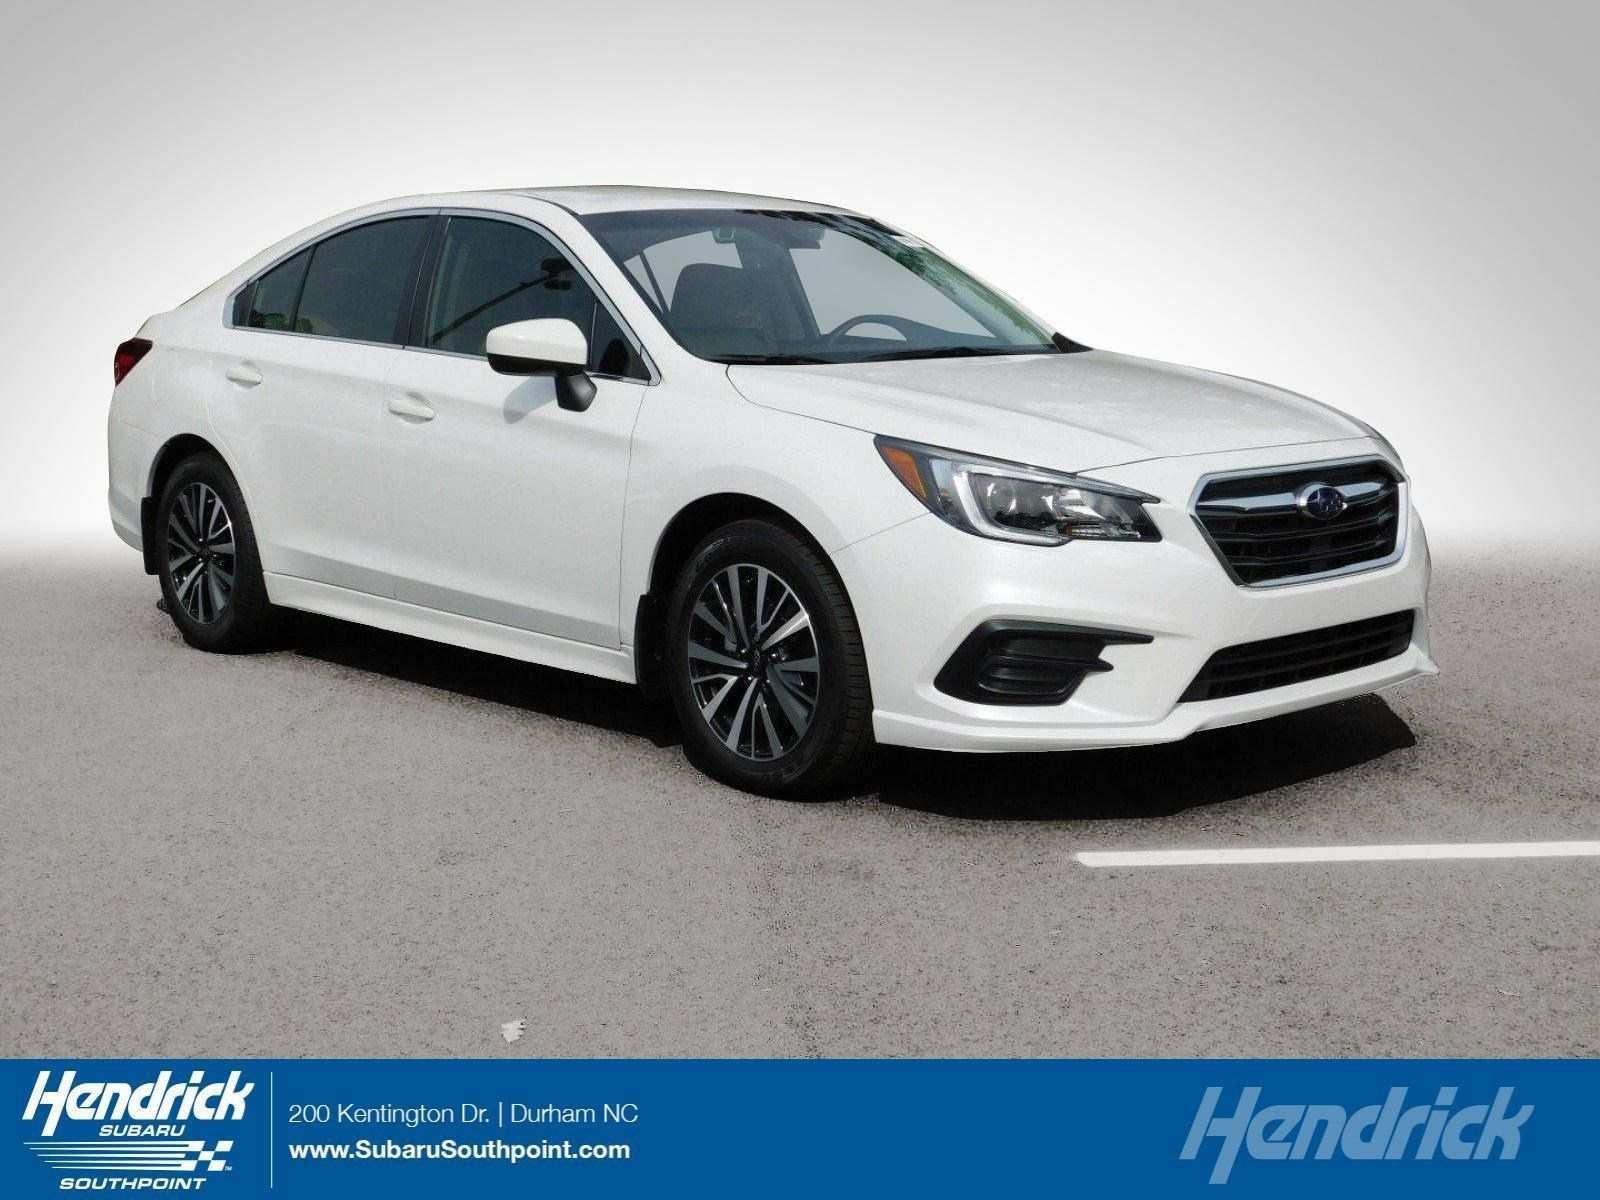 62 New Subaru Brat 2019 Configurations by Subaru Brat 2019